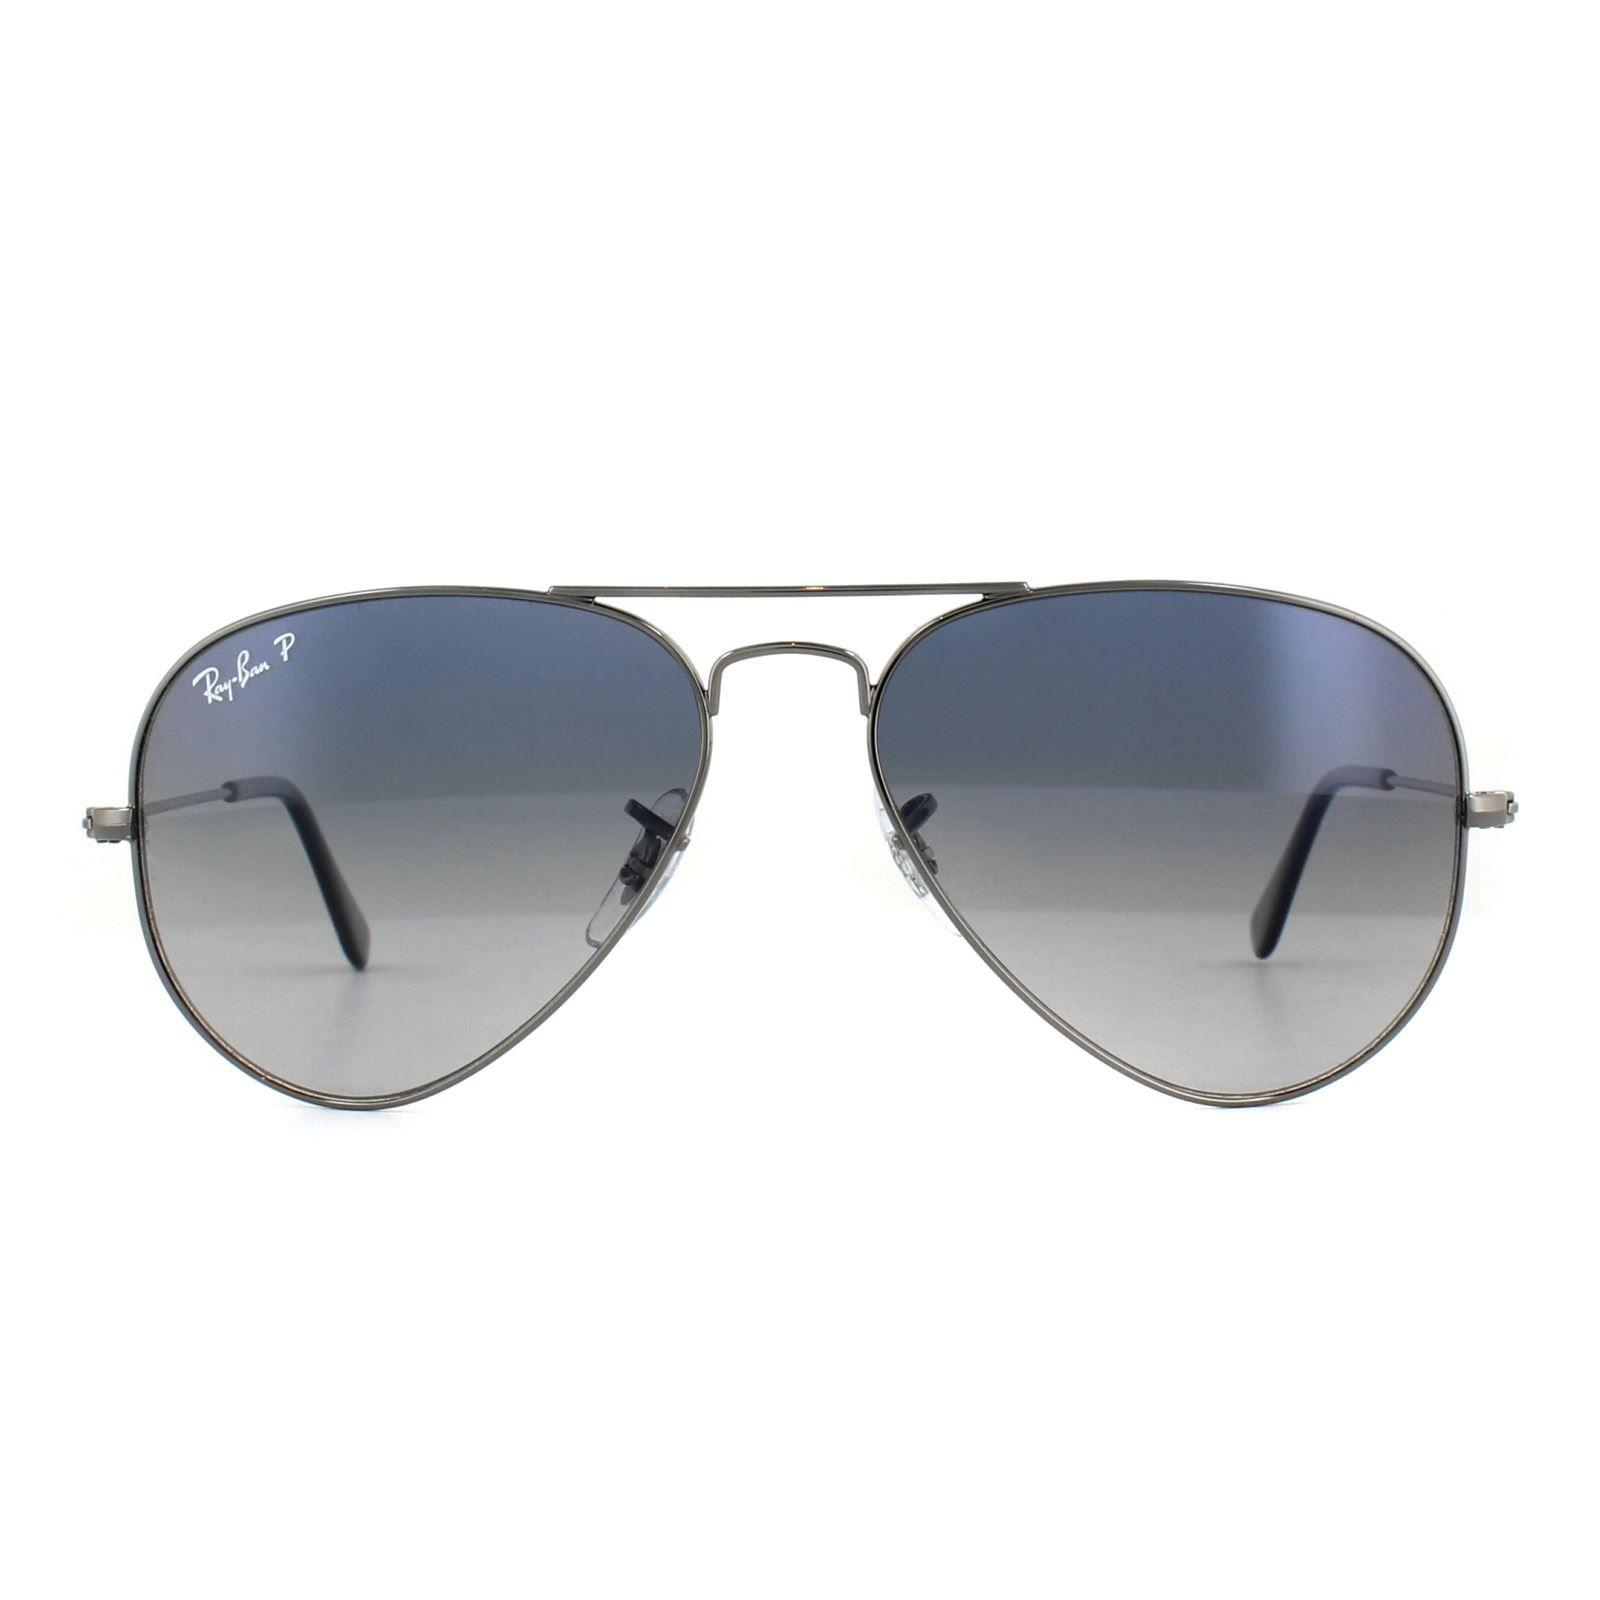 Ray-Ban Sunglasses Aviator 3025 Gunmetal Polarized Blue Gradient Grey 004/78 55mm